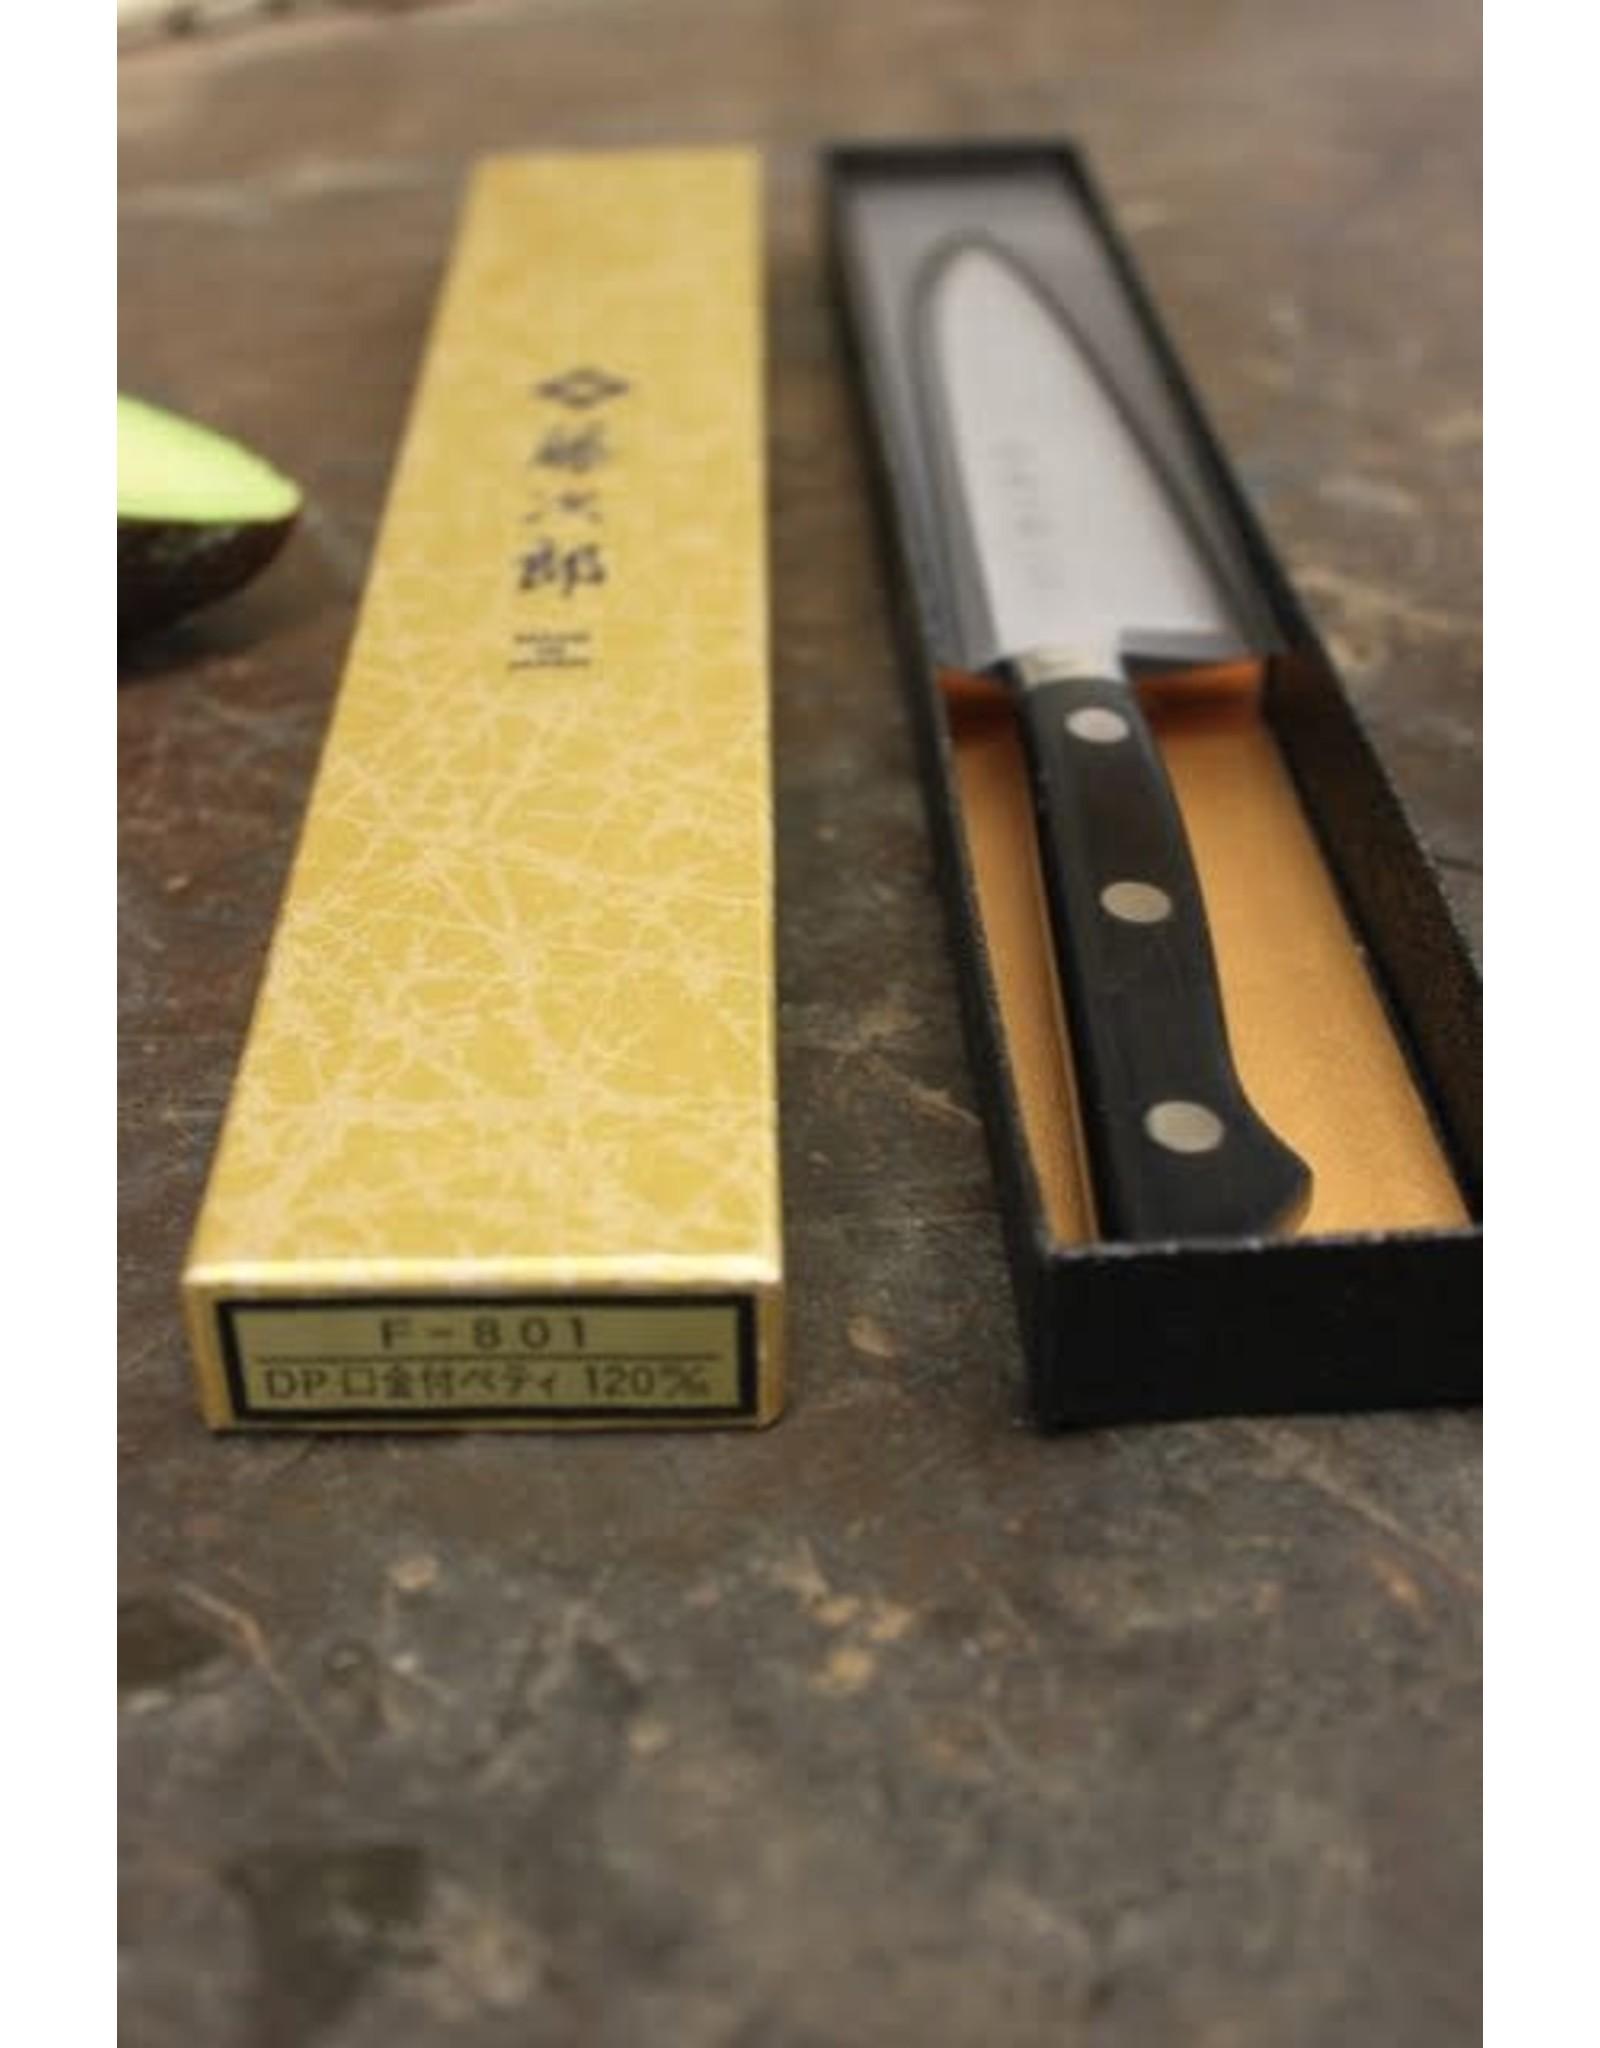 Tojiro Tojiro F-801 Paring / Petty Knife